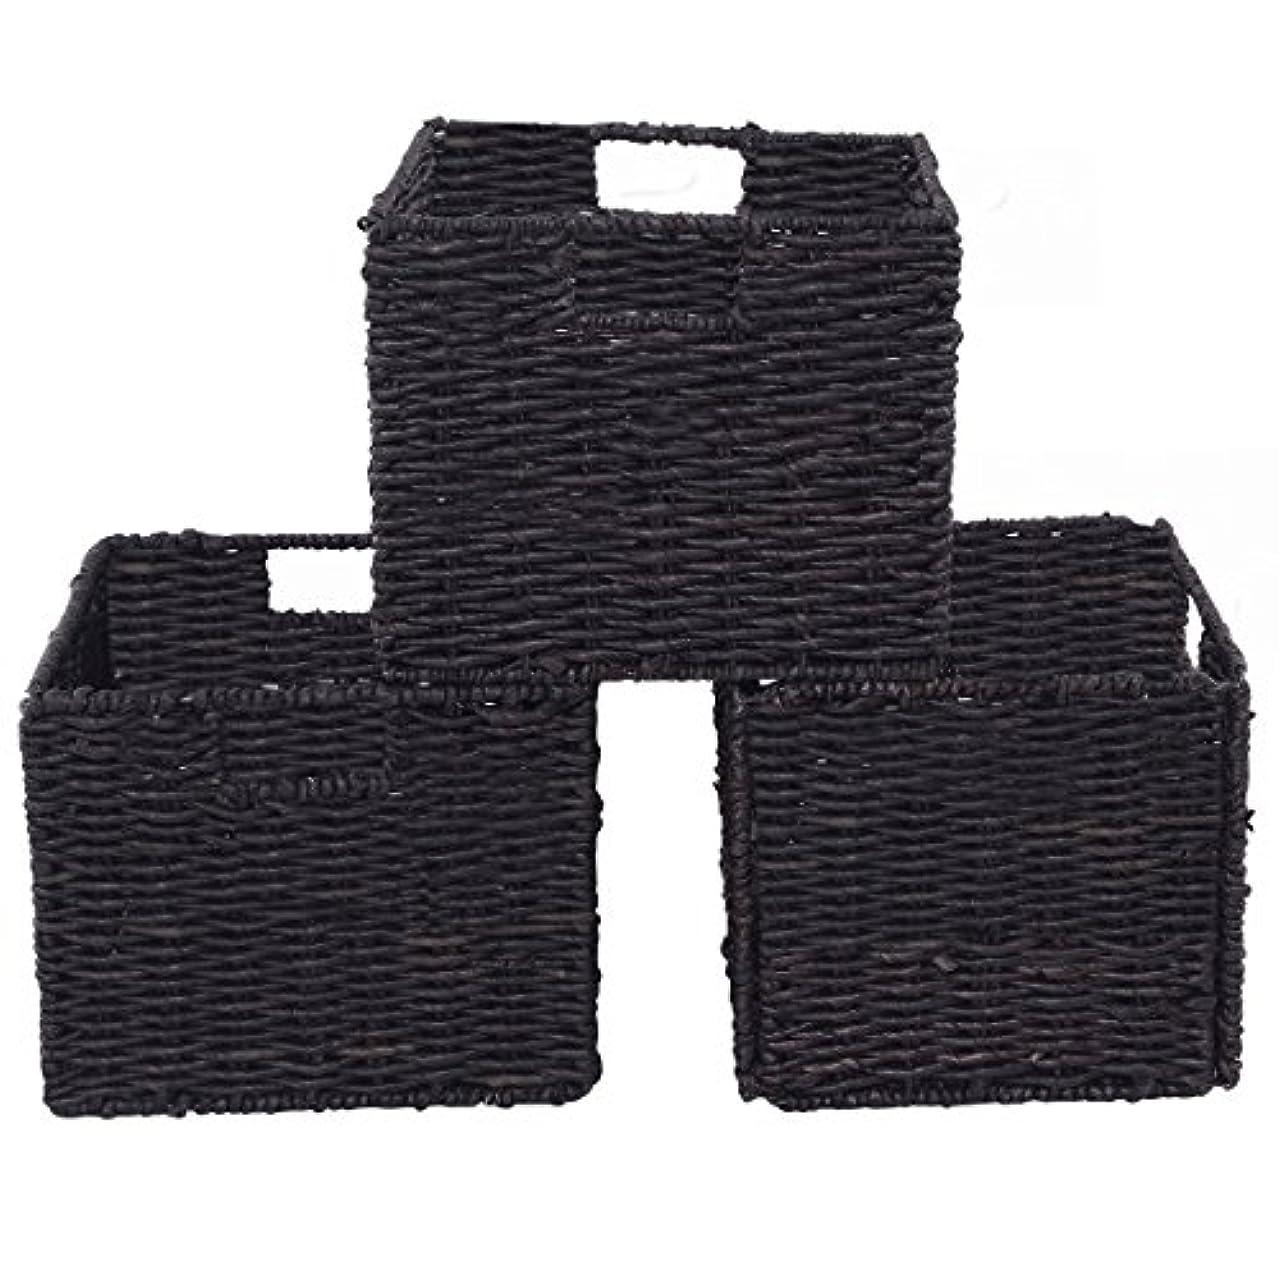 Shining Bamboo Storage Baskets Folding Nesting Rectangular Organizer Home Room Set of 3